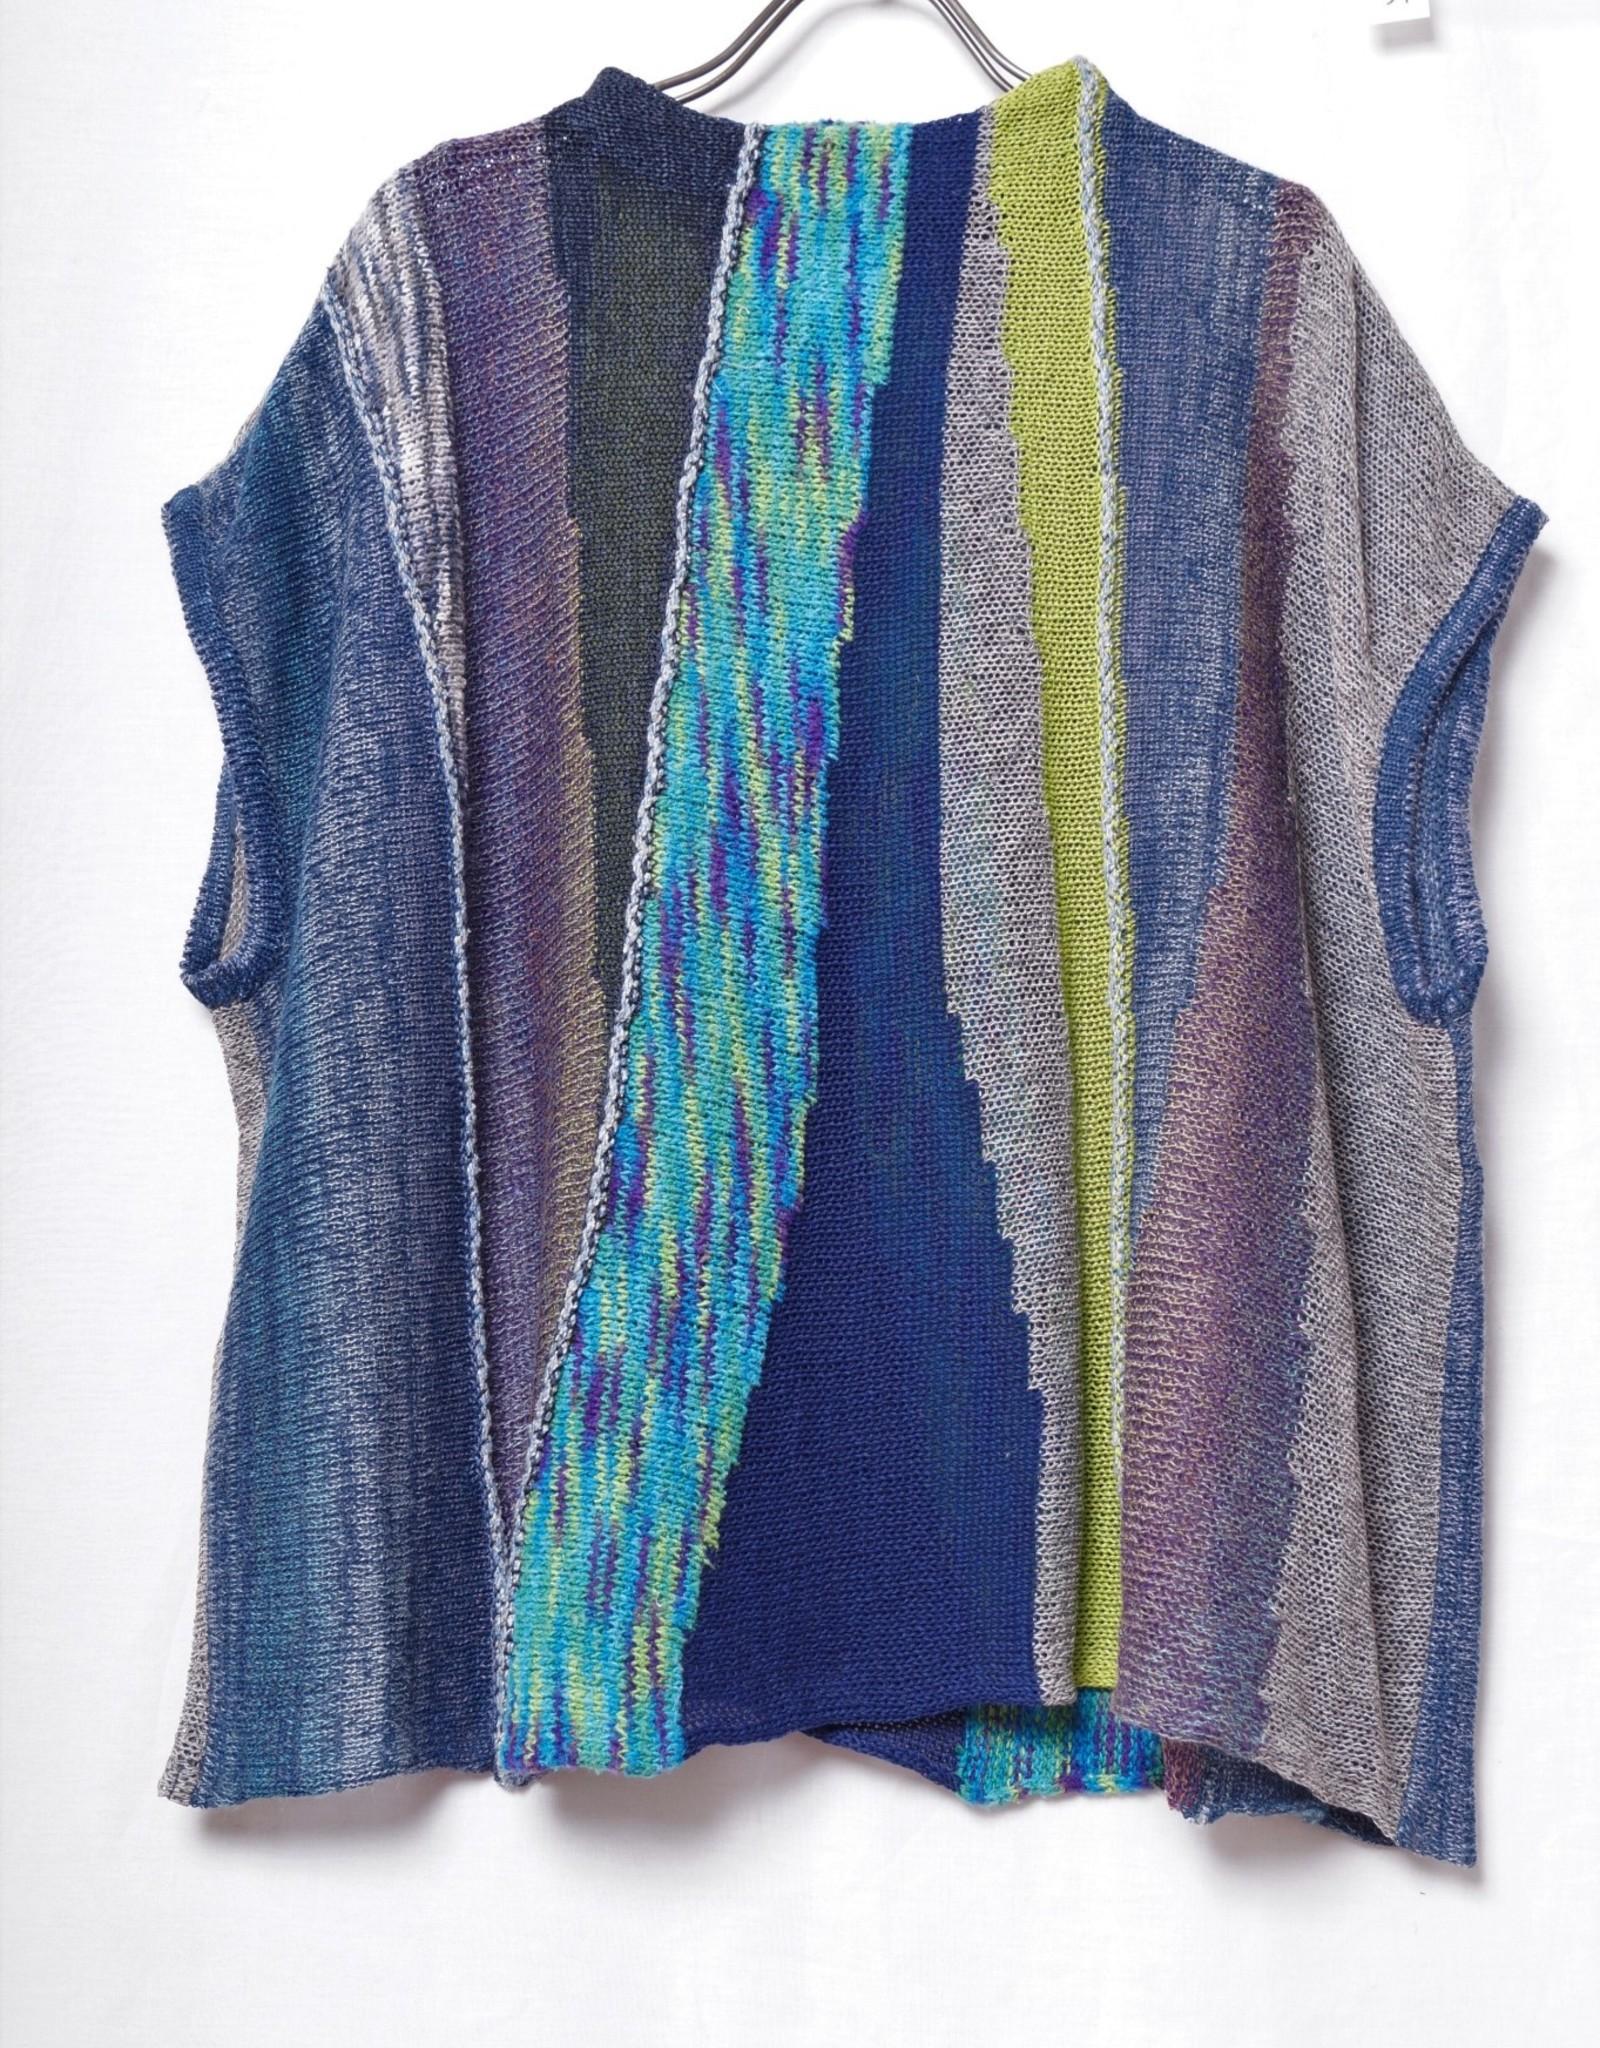 M. & KYOKO Sleeveless Sweater KBAH531W